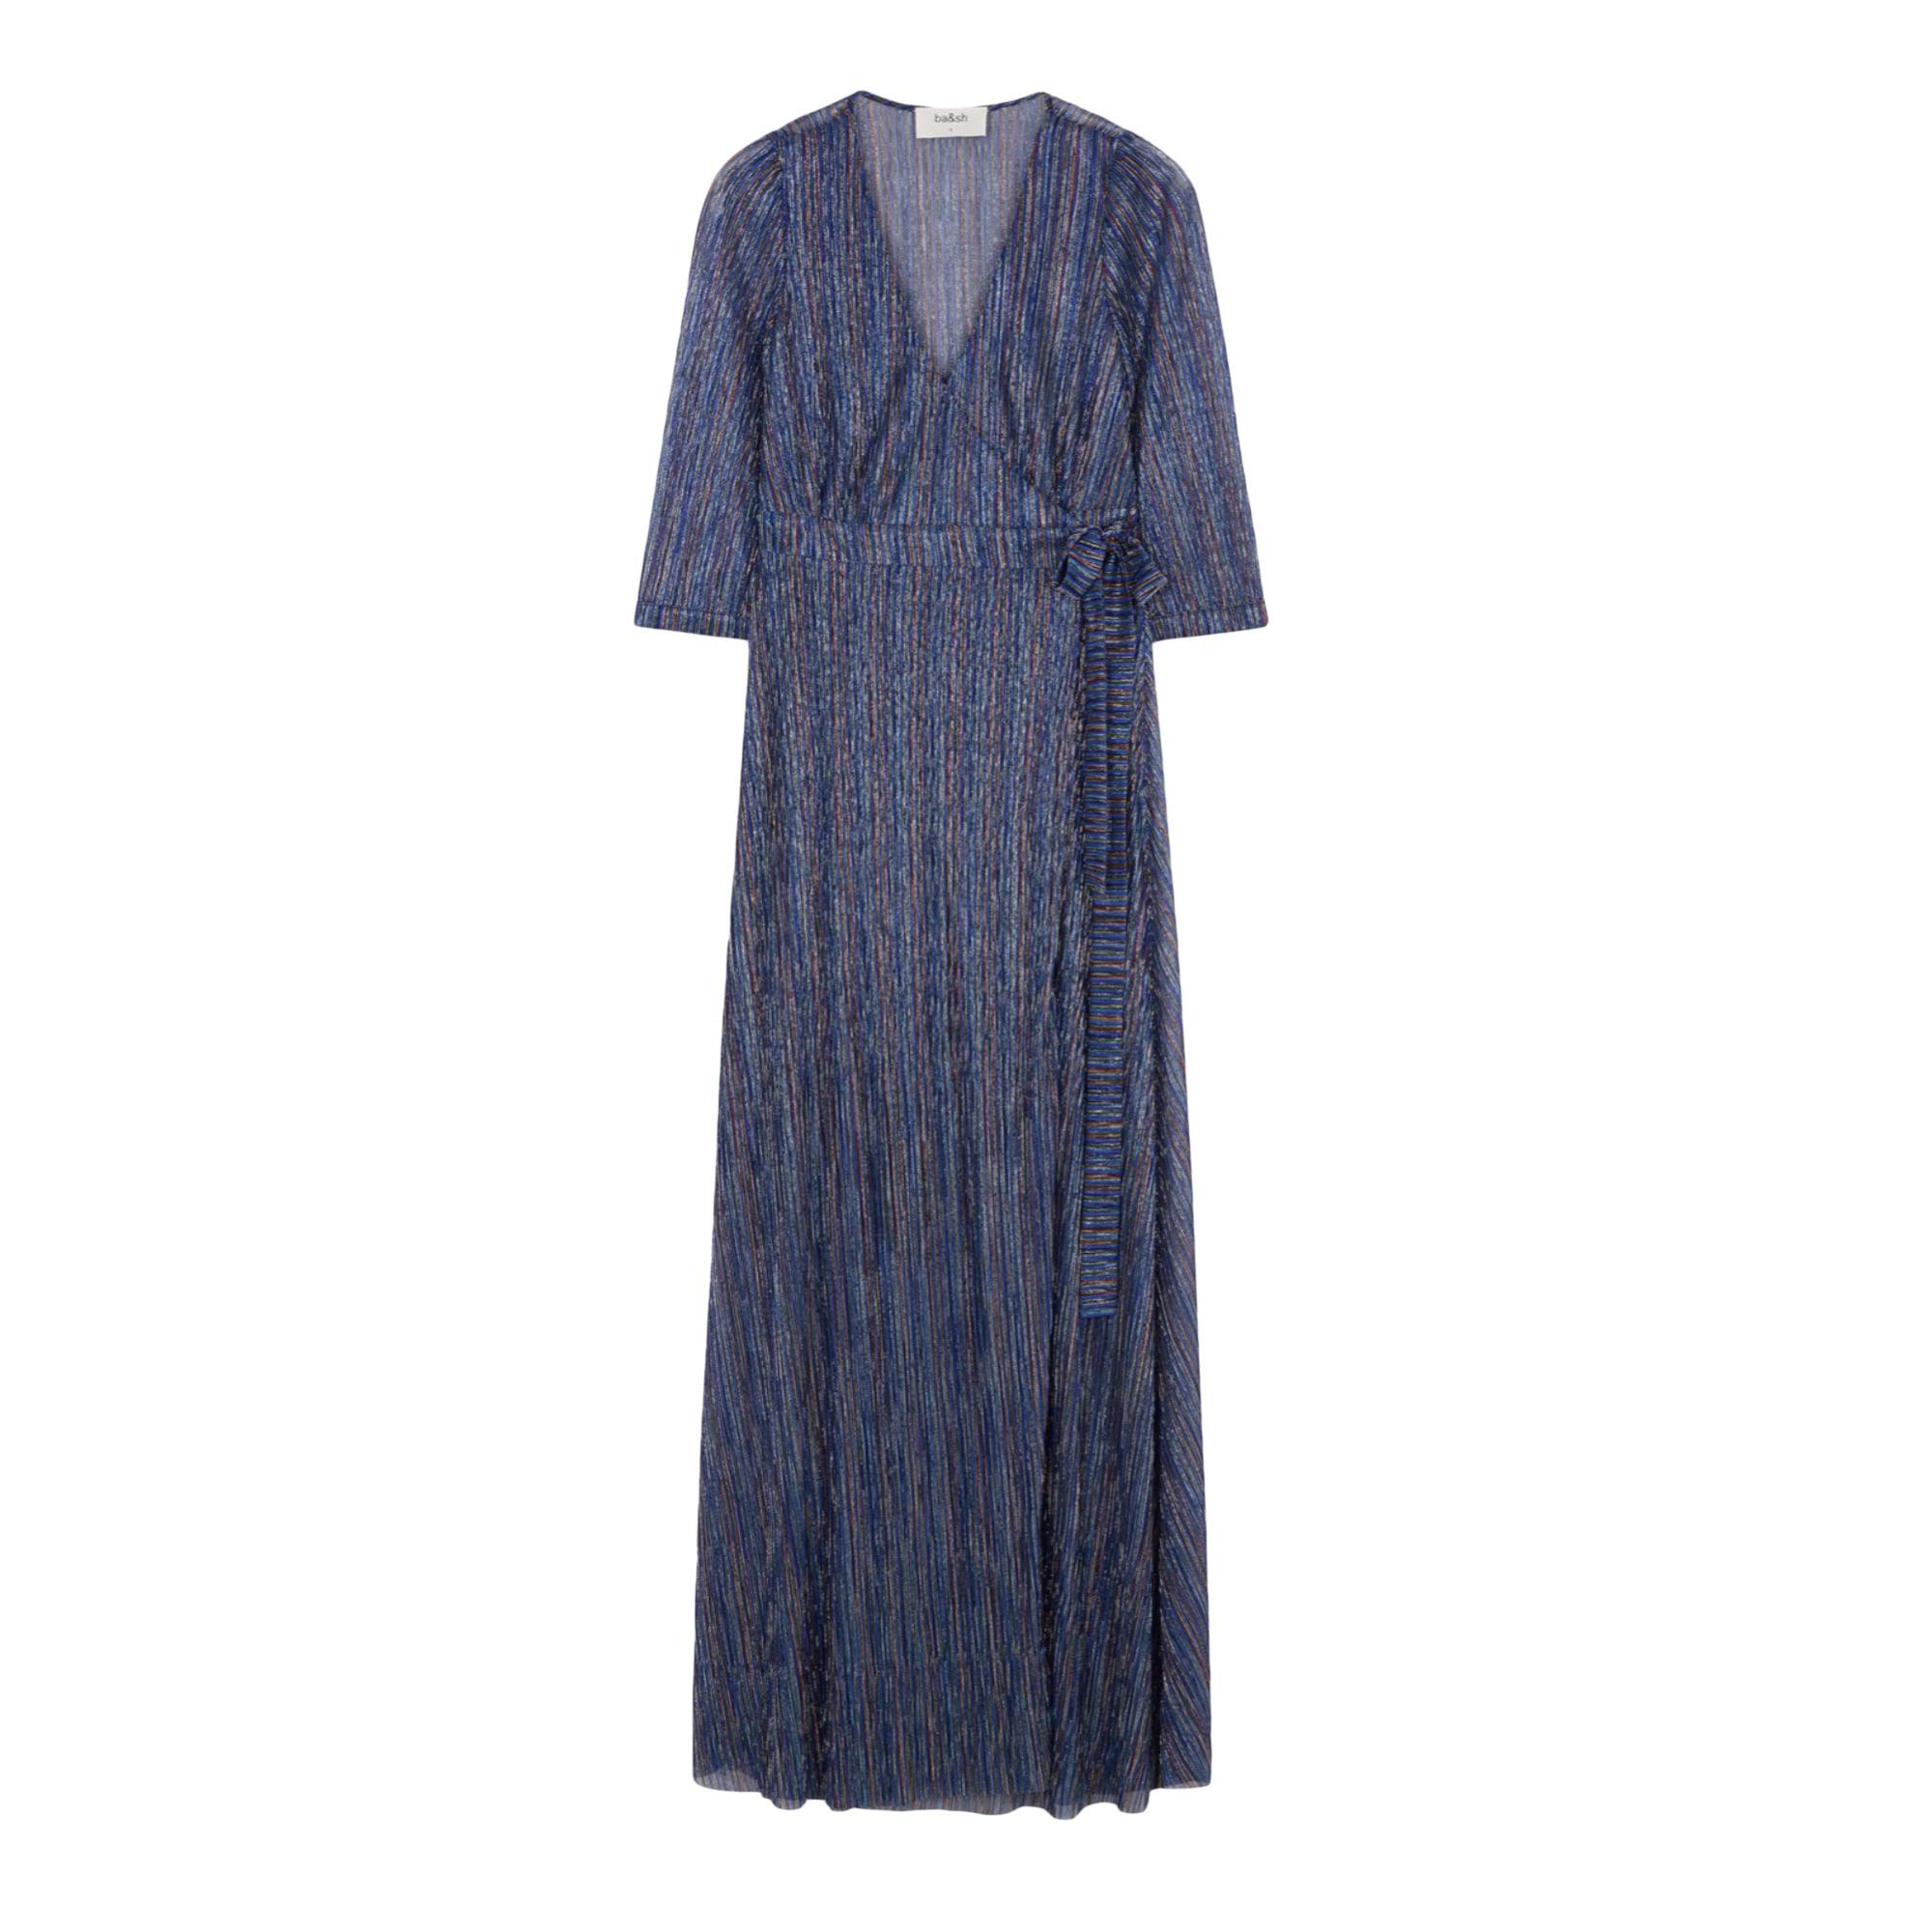 Maxi Dress BA&SH Blue, navy, turquoise